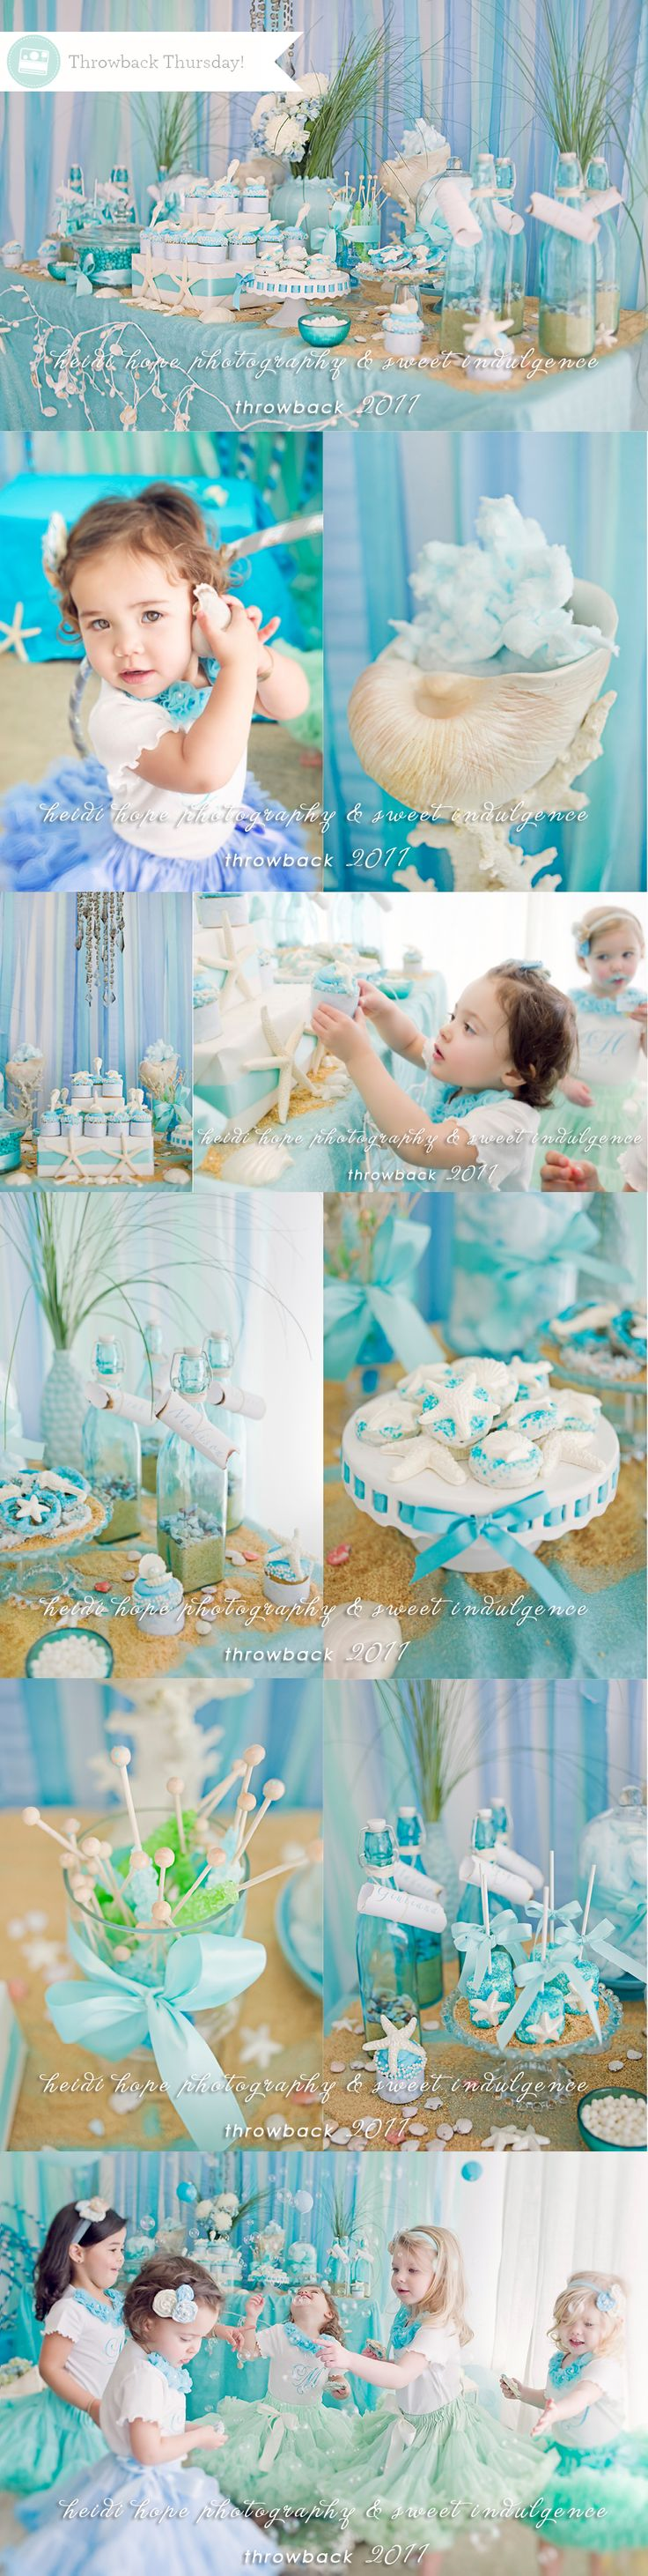 #mermaid-pettiskirt-aqua-party-mint-children's-photographer-proof-2